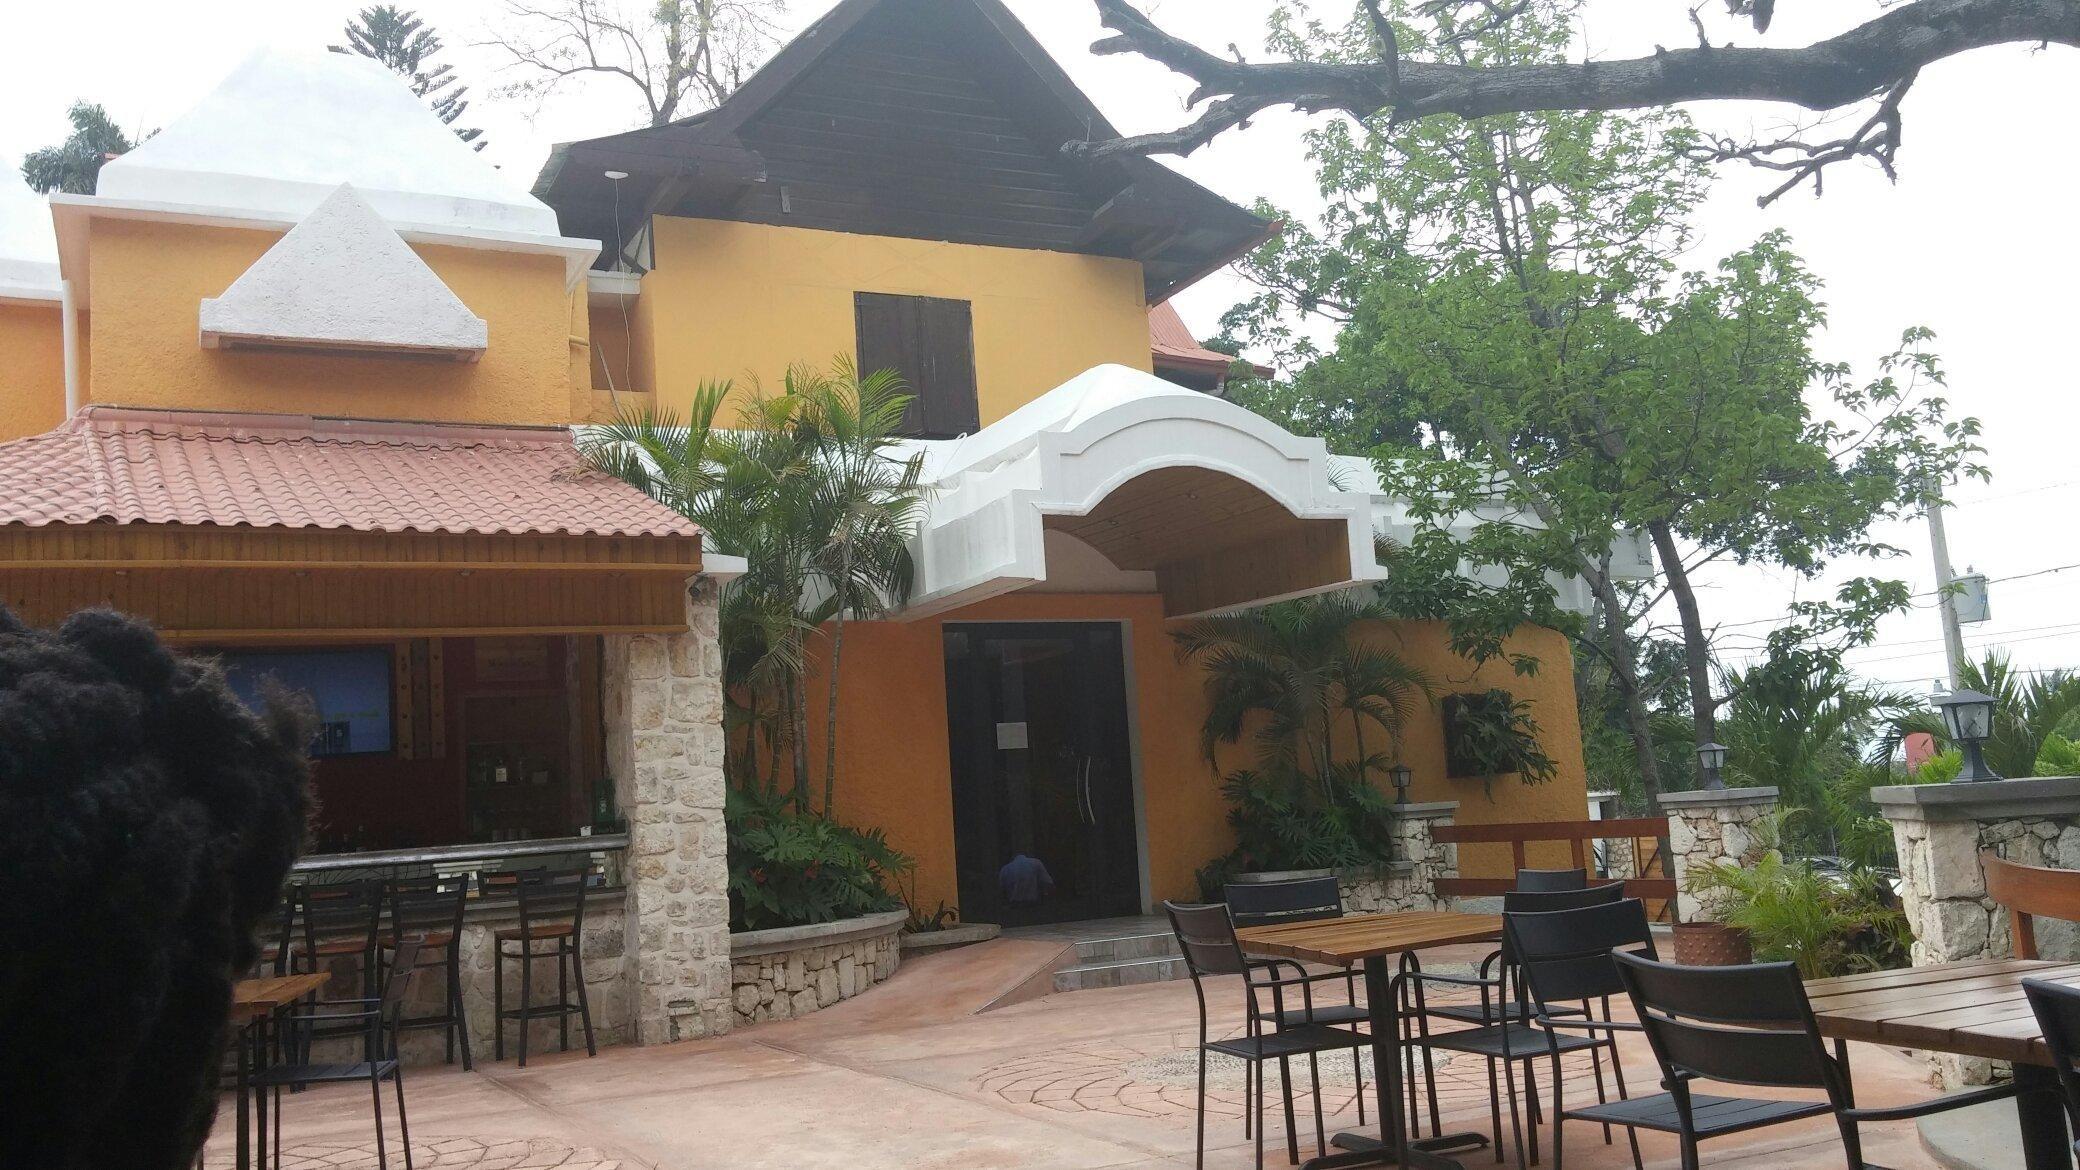 Kokoye Restaurant Grill Bar Port Au Prince Haiti With Images Port Au Prince Restaurant Places To Go